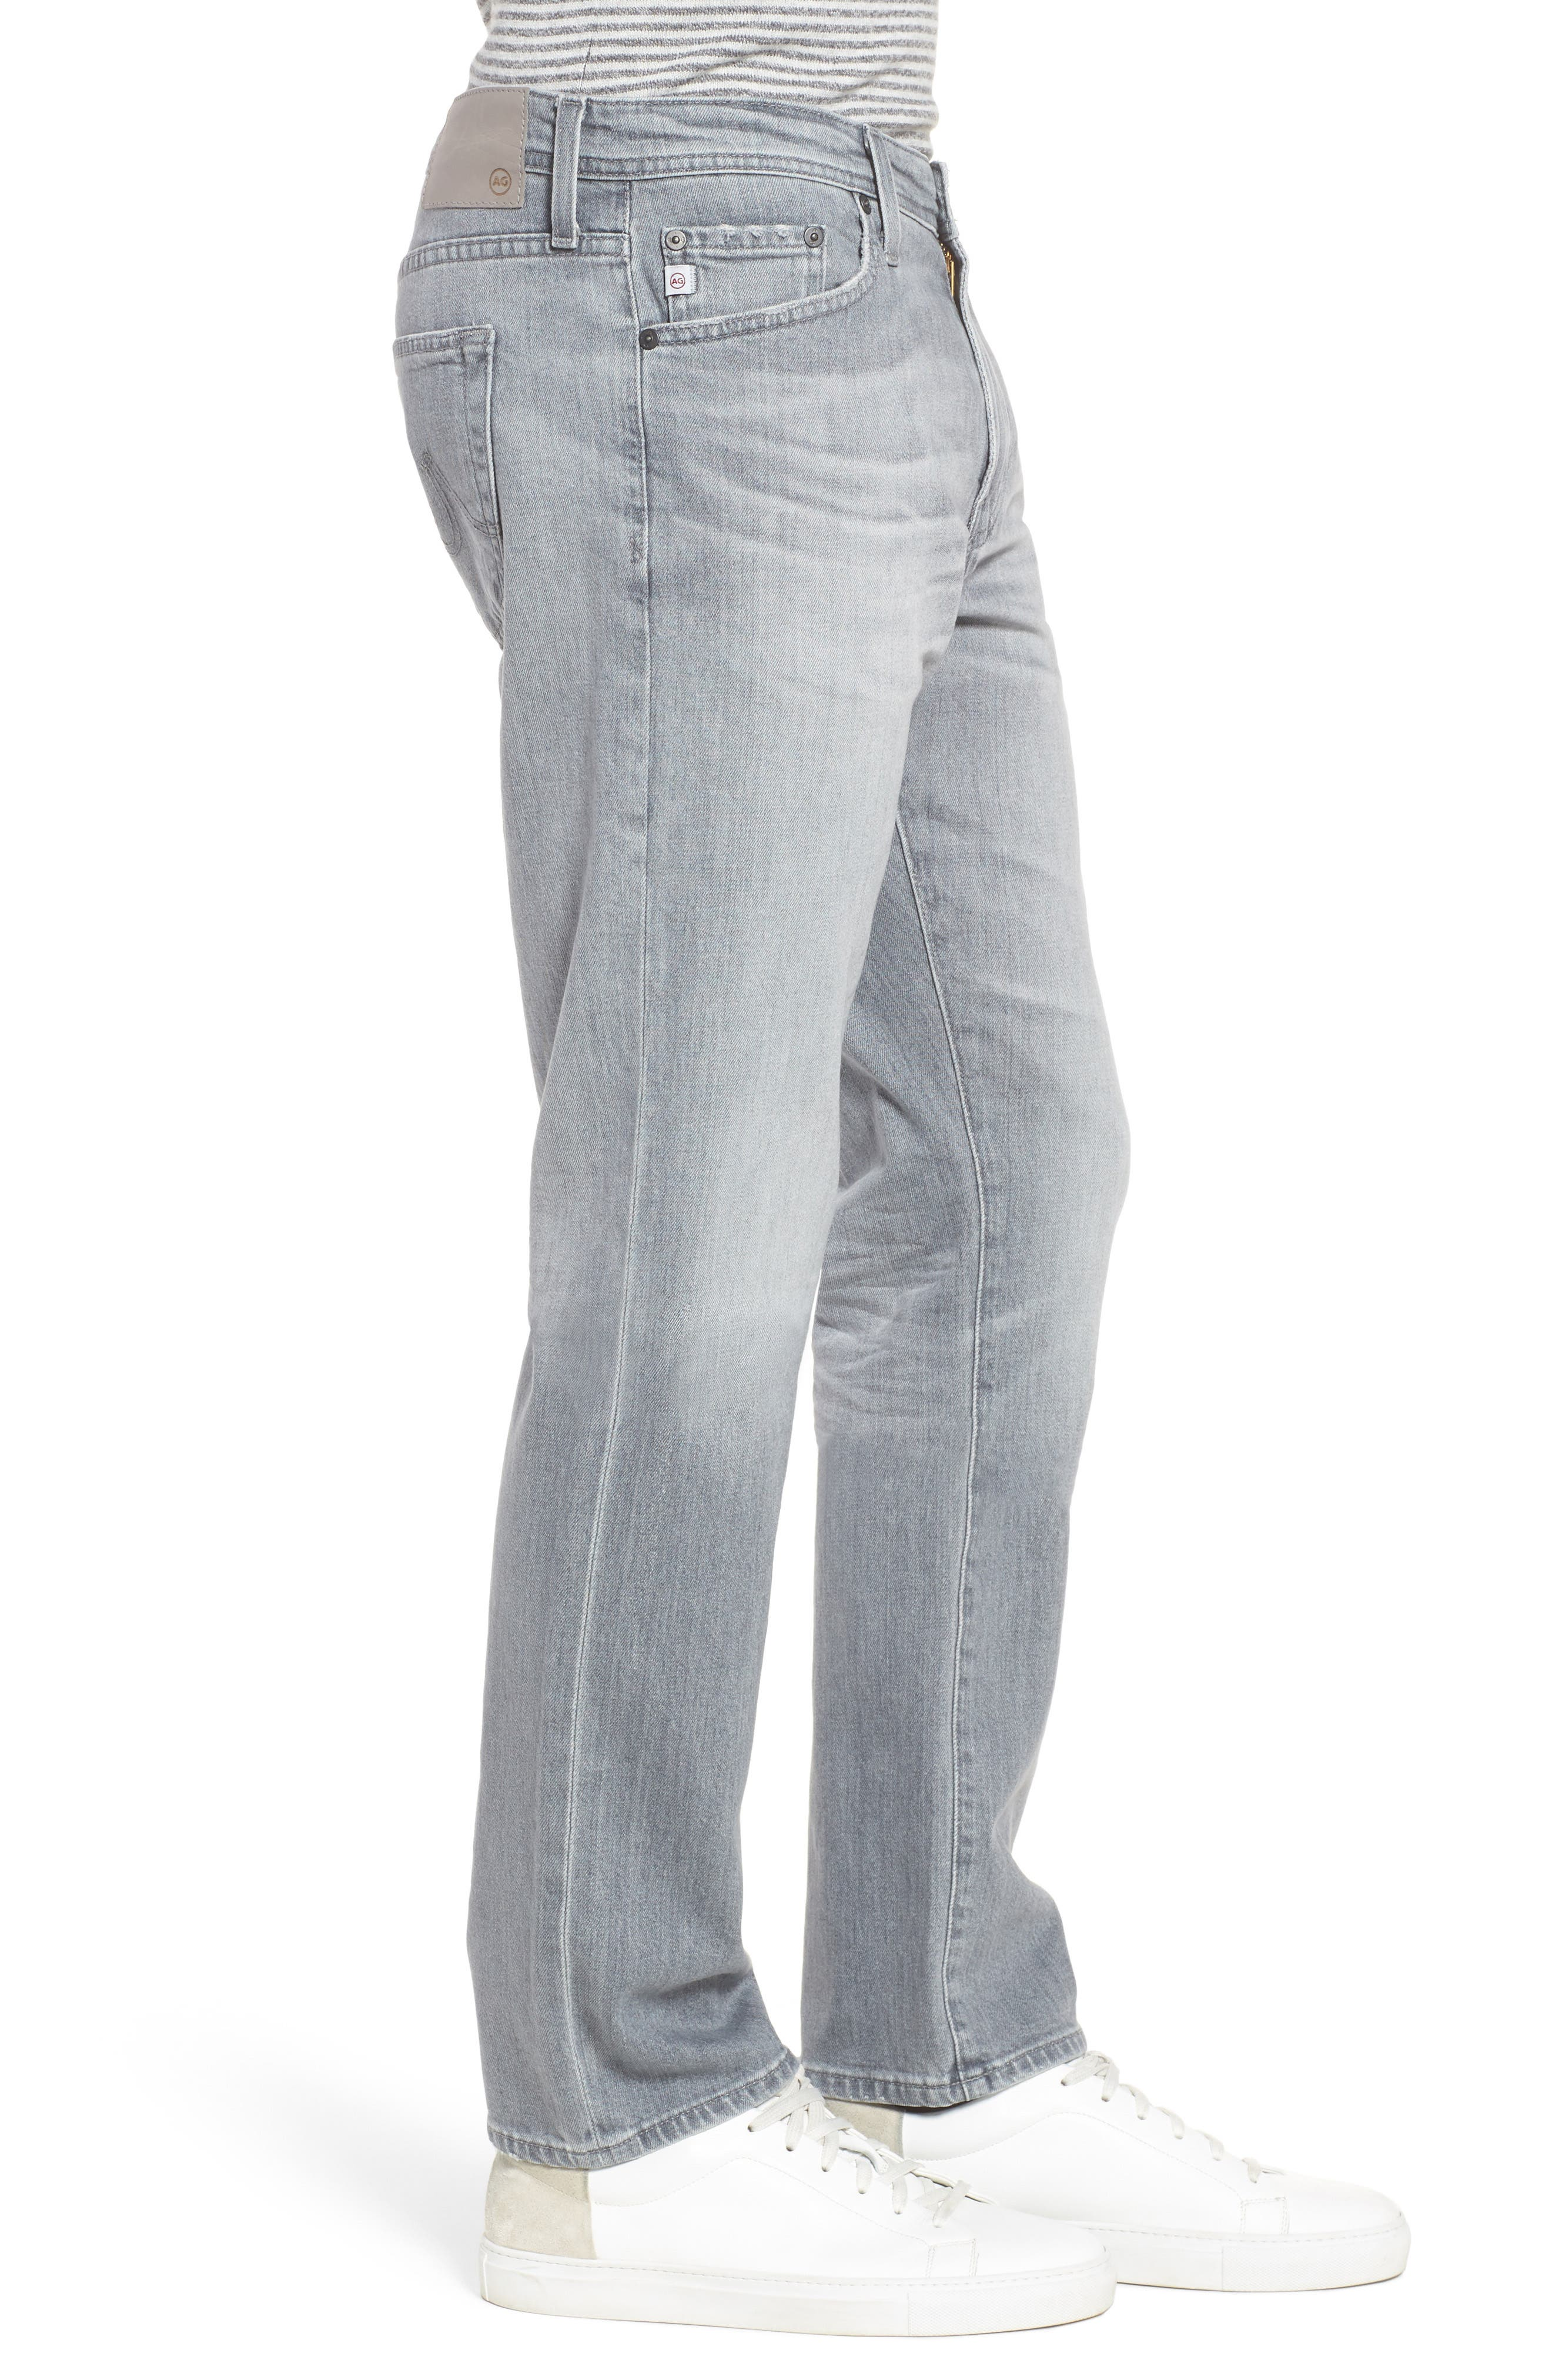 Everett Slim Straight Fit Jeans,                             Alternate thumbnail 3, color,